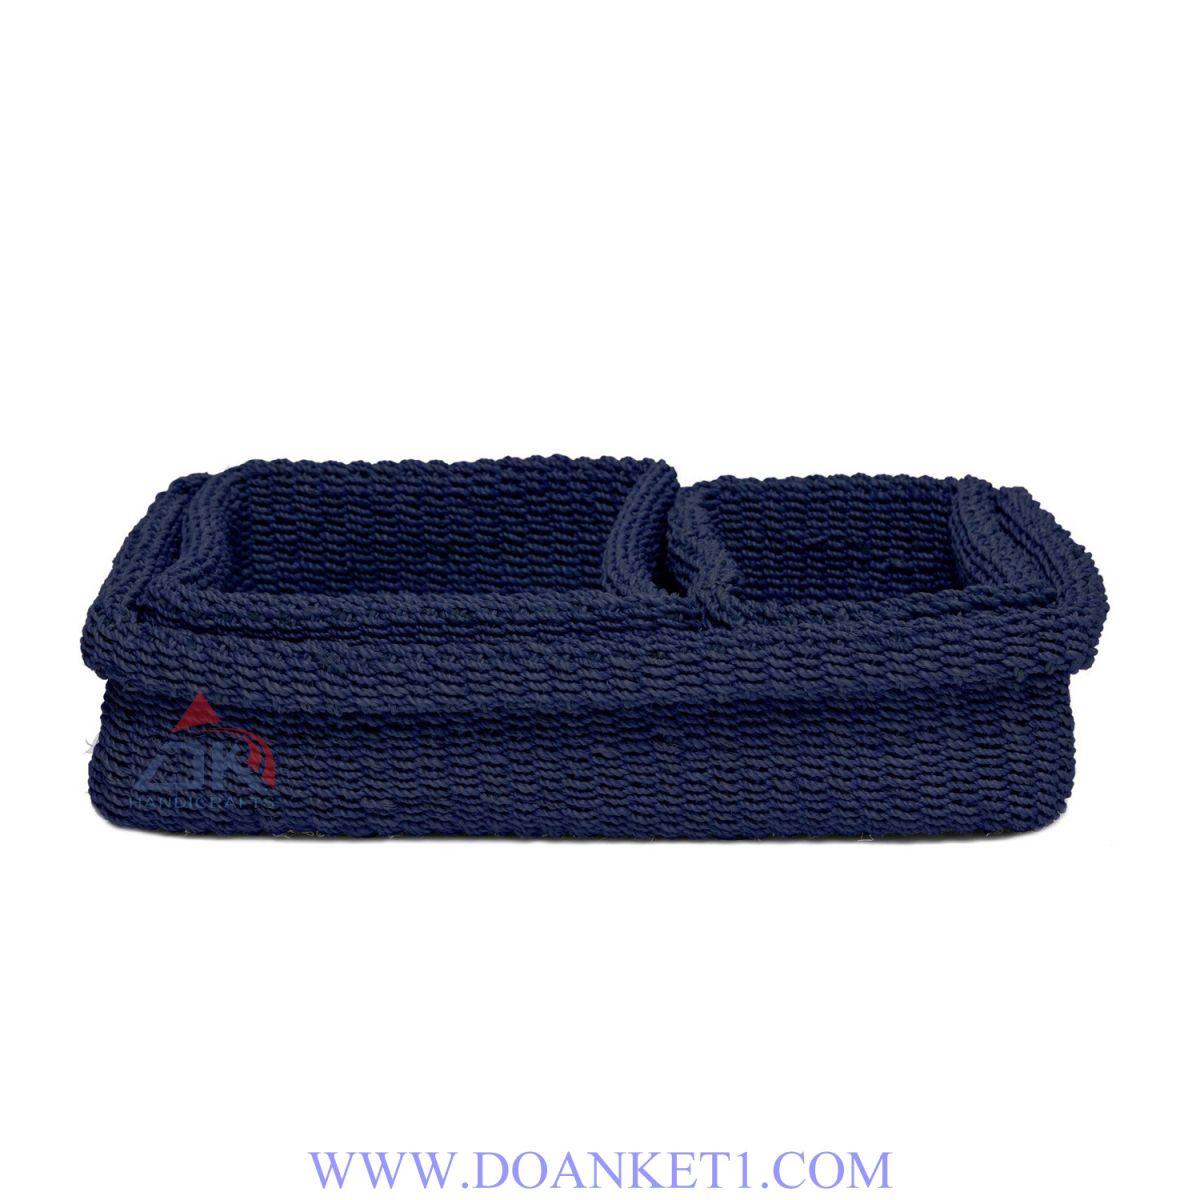 Textile Basket # DK136